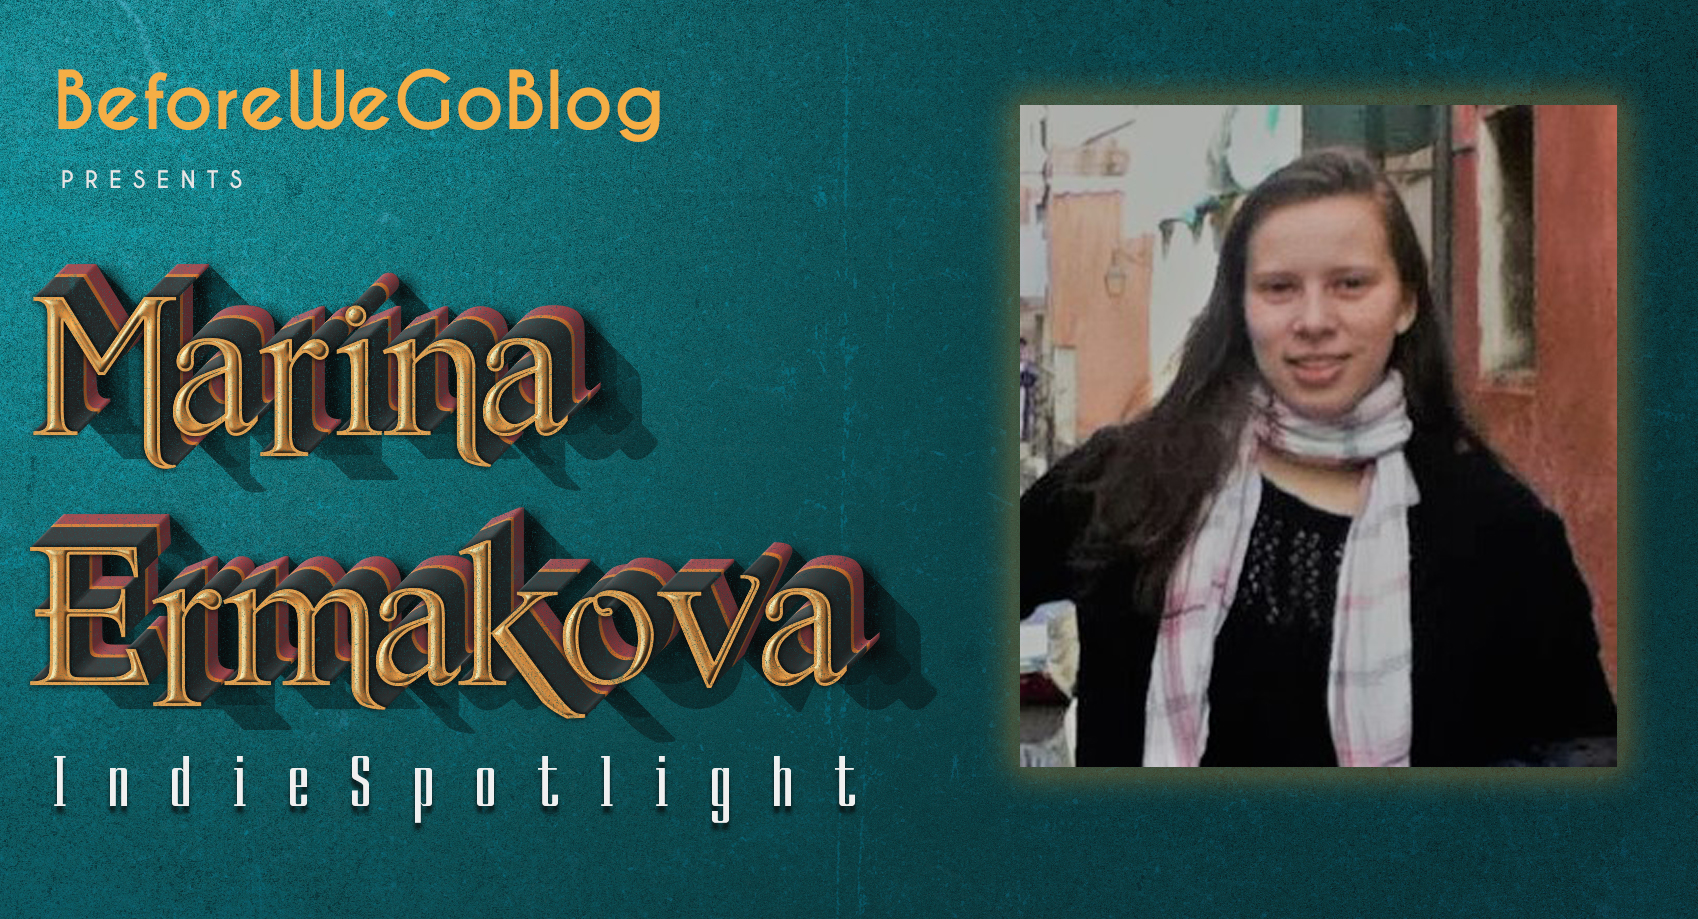 Indie Spotlight – Marina Ermakova